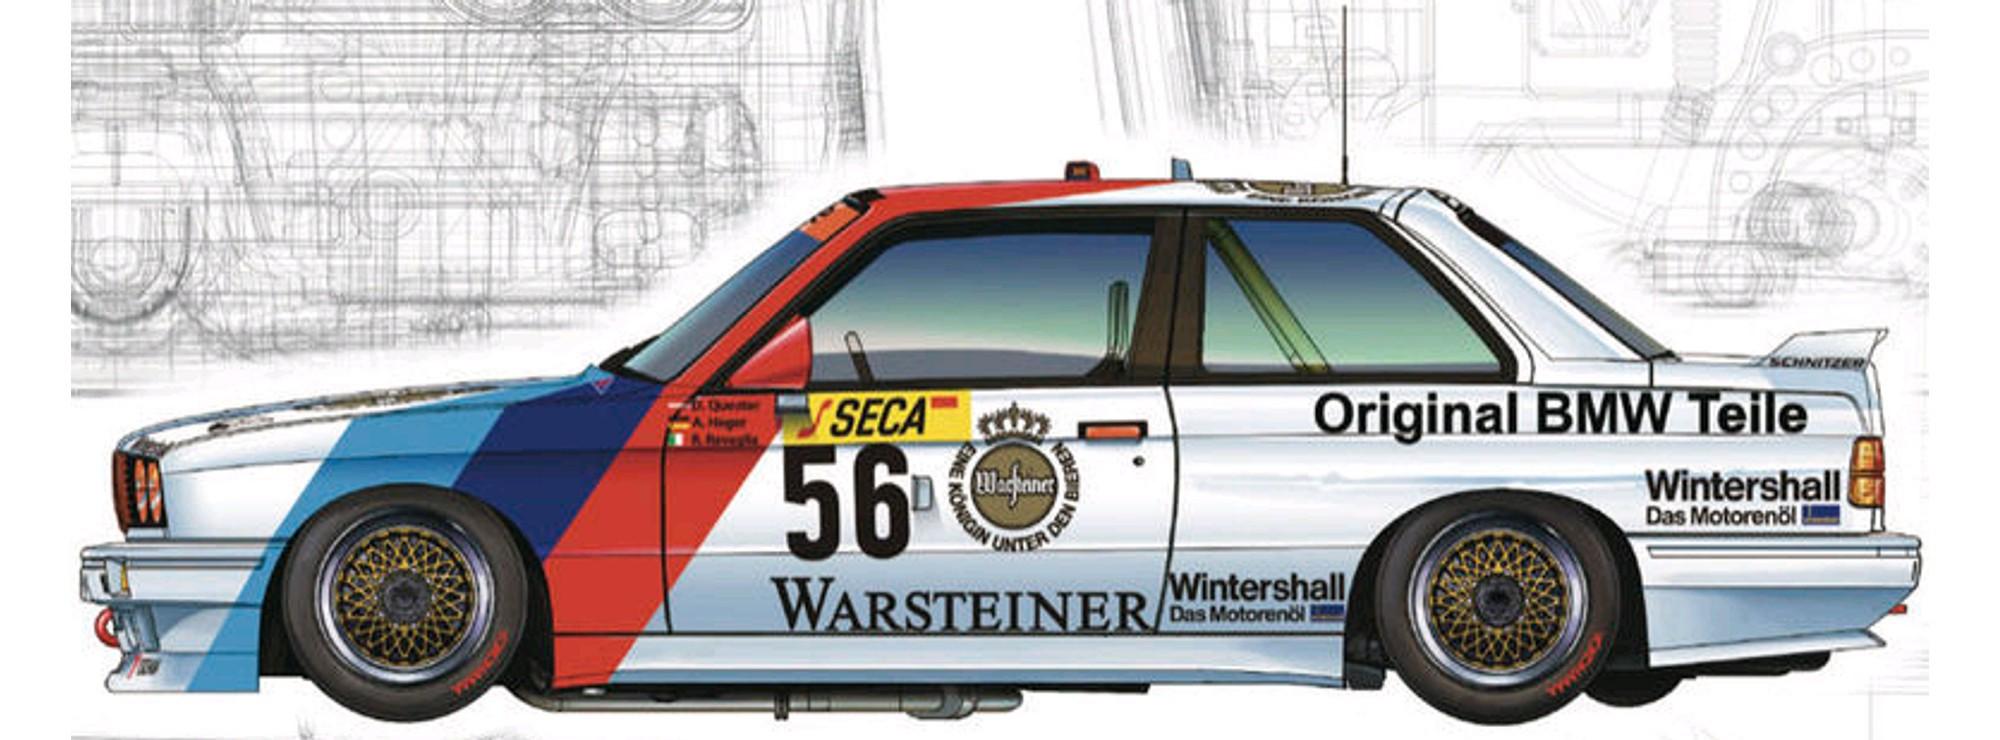 NUNU-BEEMAX BMW M3 E30 '88 Spa 24 Hours Winner